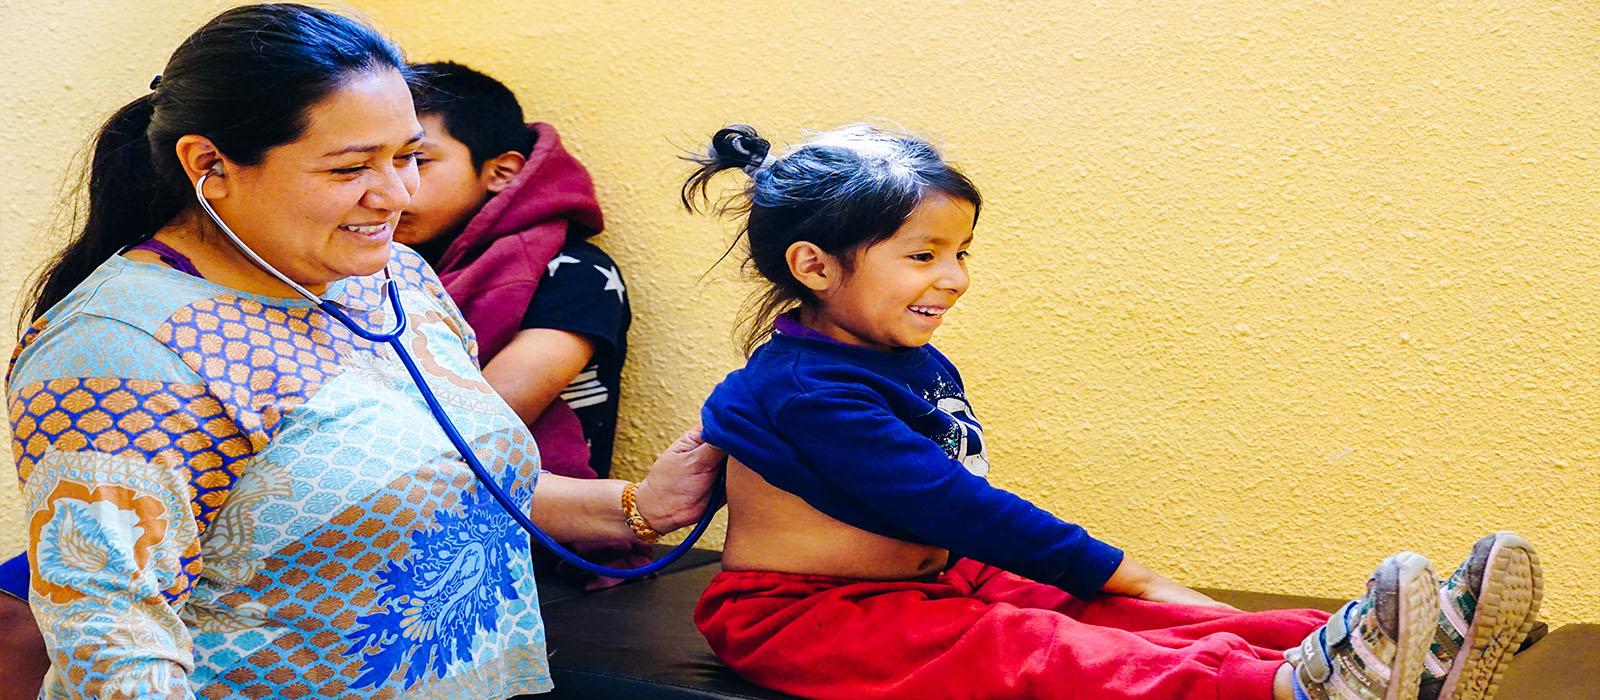 Checkup_in_Guatemala.jpg